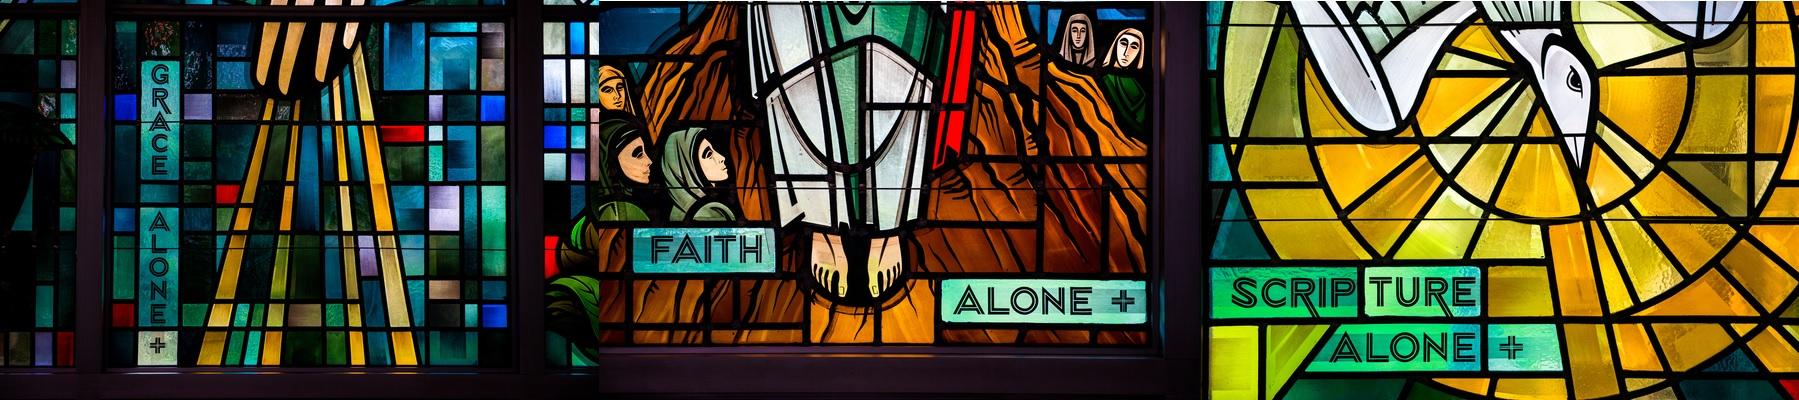 Lutheran Christian beliefs, Grace Alone, Faith Alone, Scripture Alone